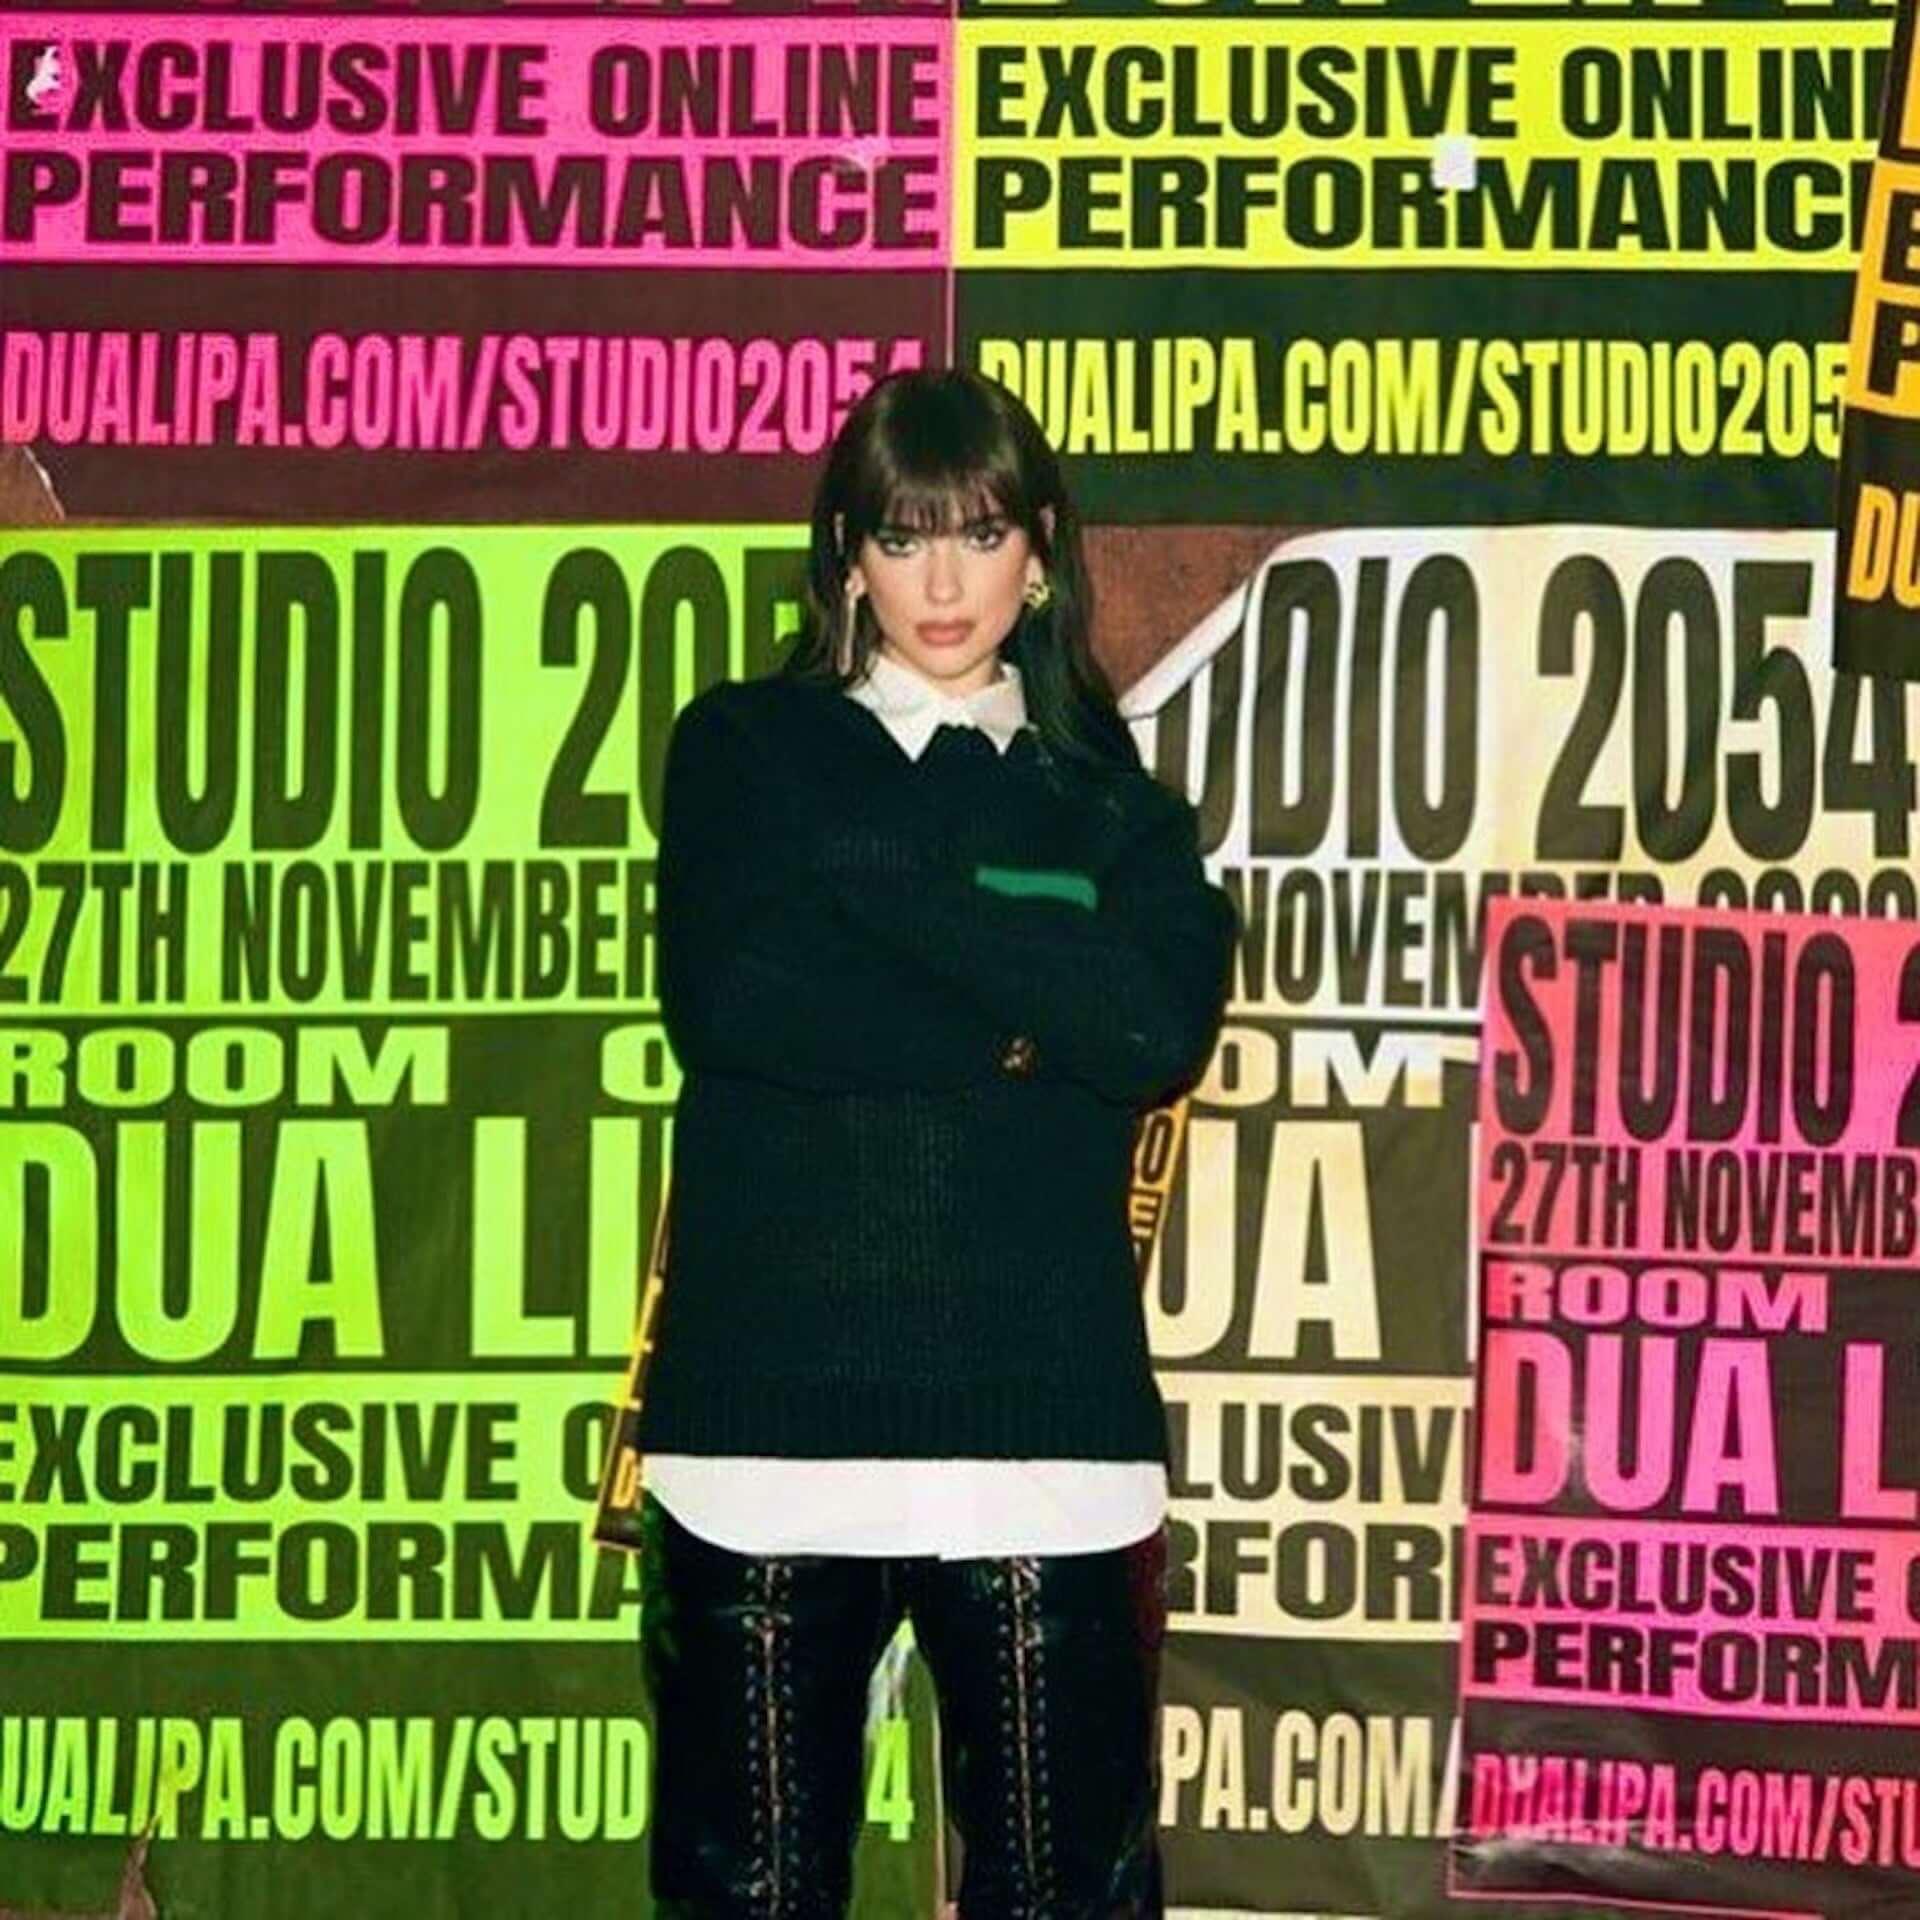 Dua Lipaが新感覚のオンラインライブ<STUDIO 2054>を開催決定!アフターパーティの映像を視聴できるチケットも展開 music201030_dualipa_1-1920x1920